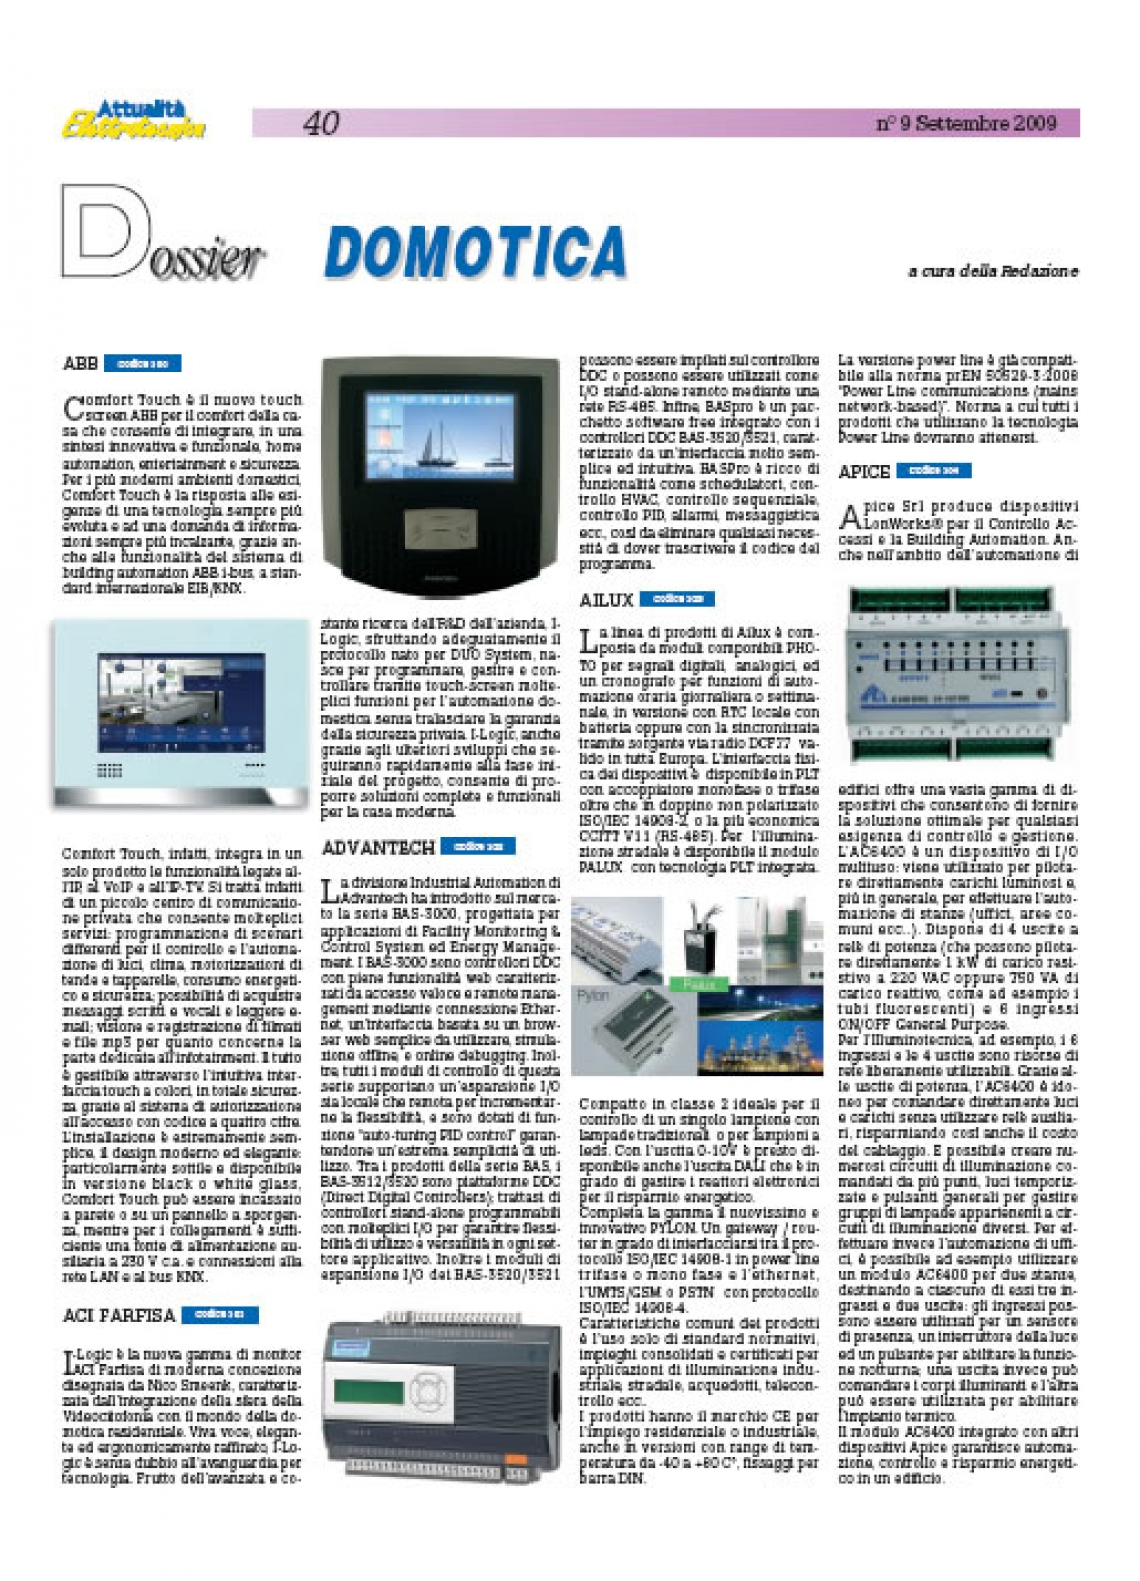 Dossier Domotica